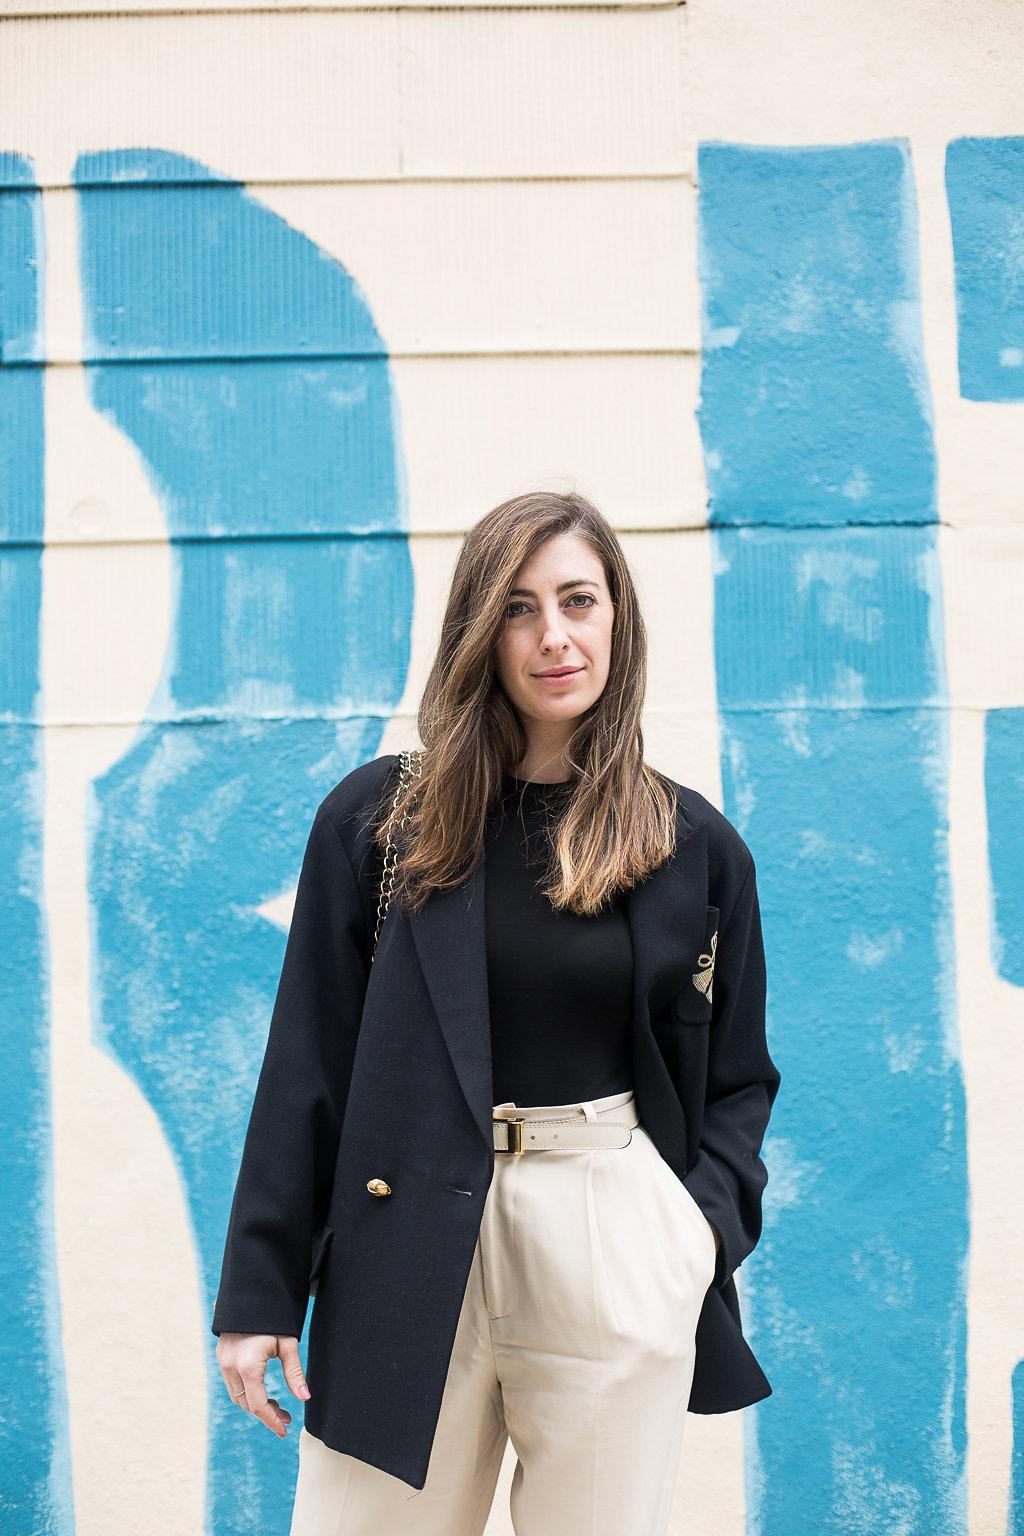 Testimonial and Headshot of Katya Libin  Co-Founder & CEO of HeyMama